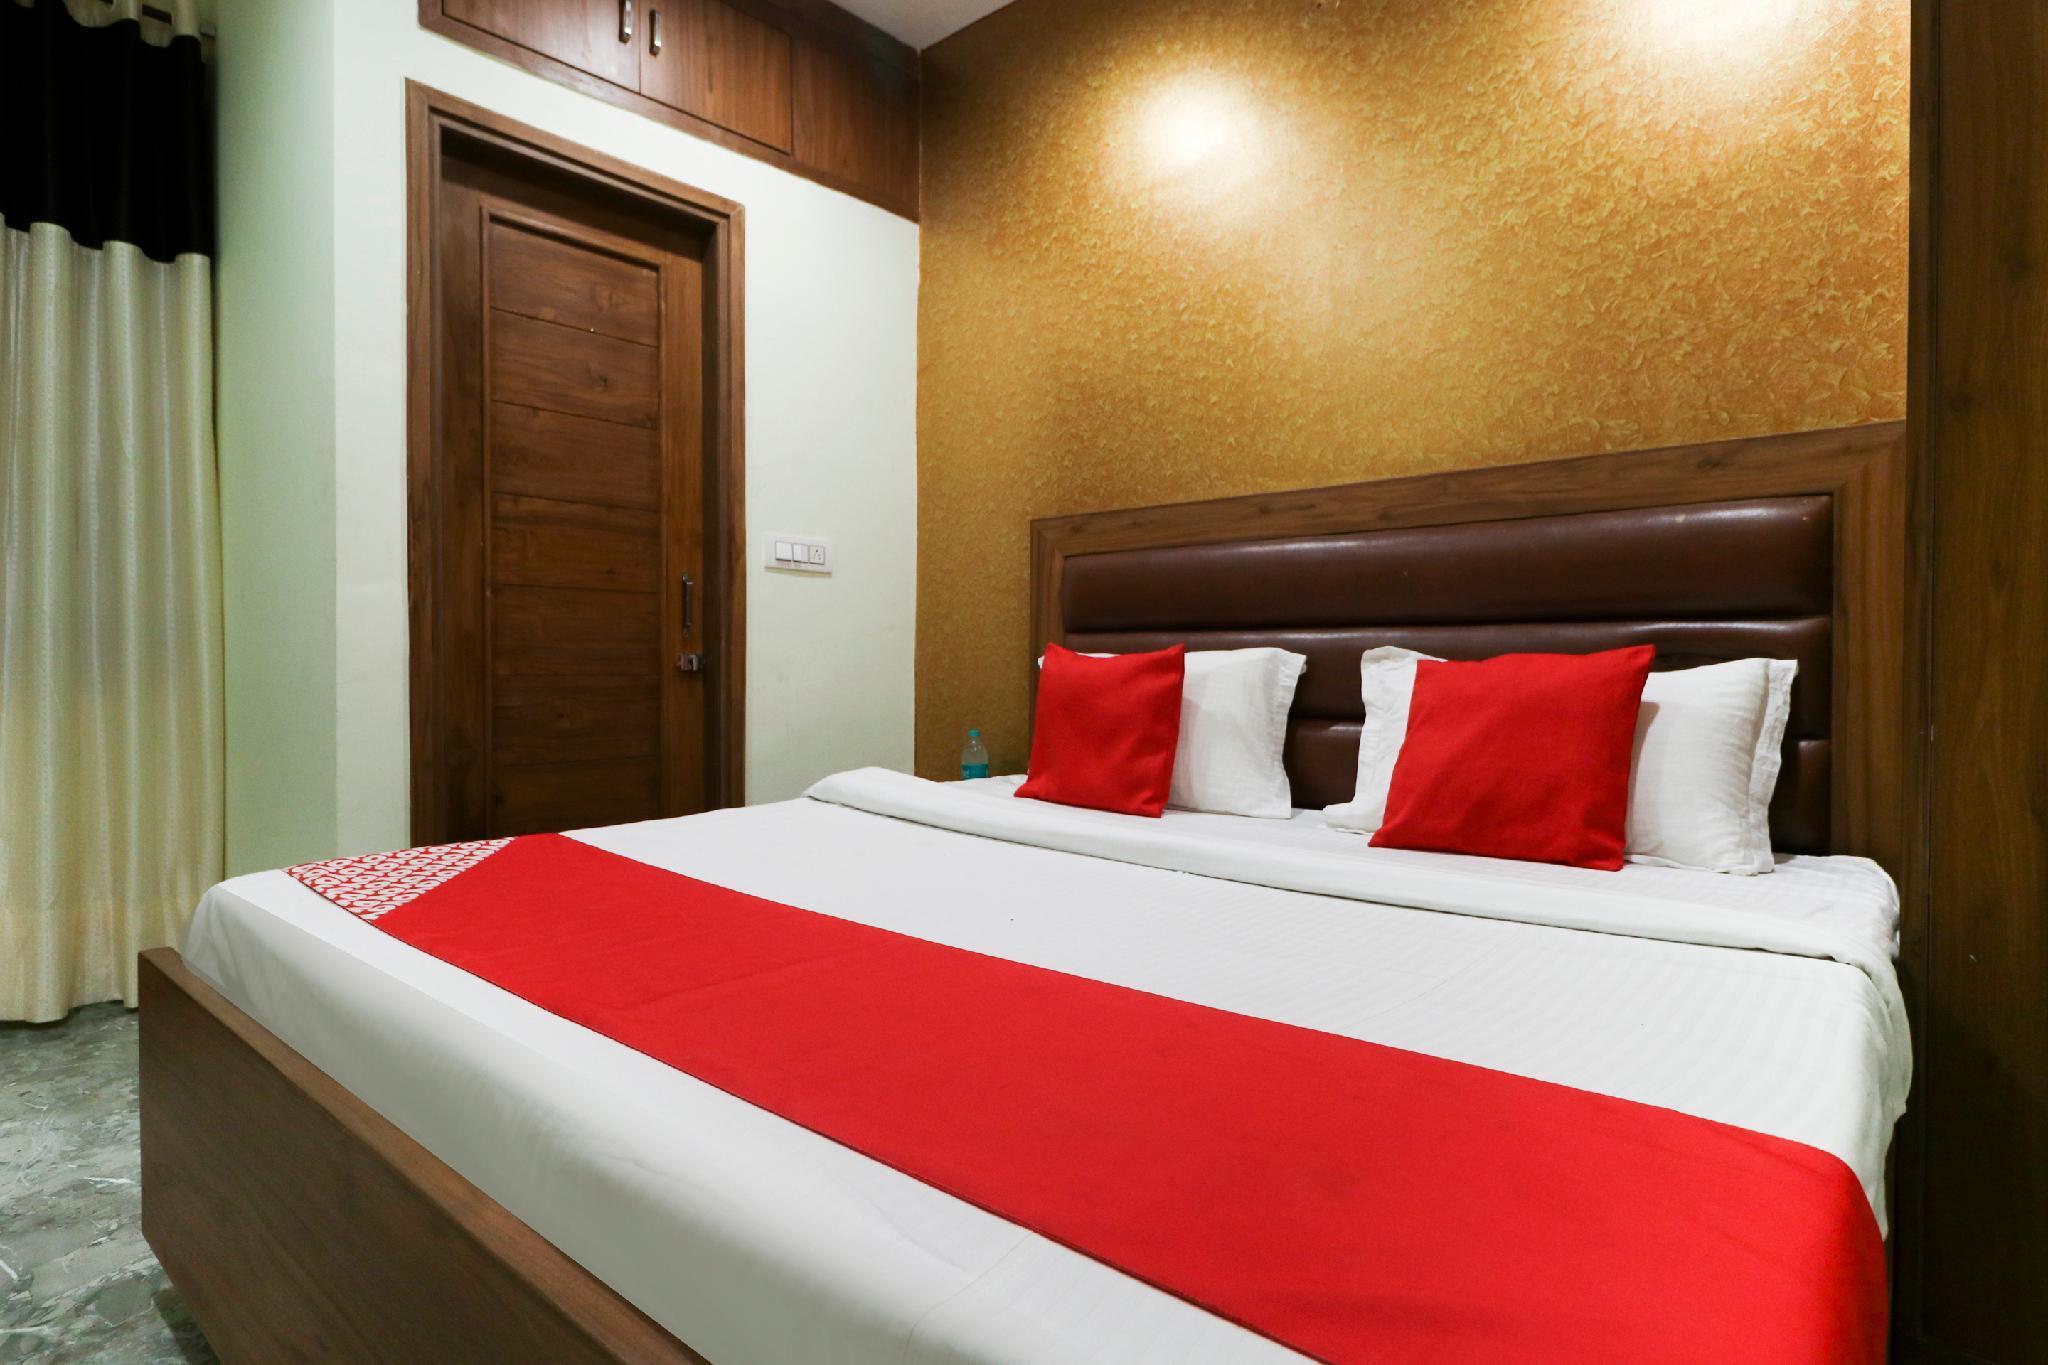 OYO 46567 Hotel New Property